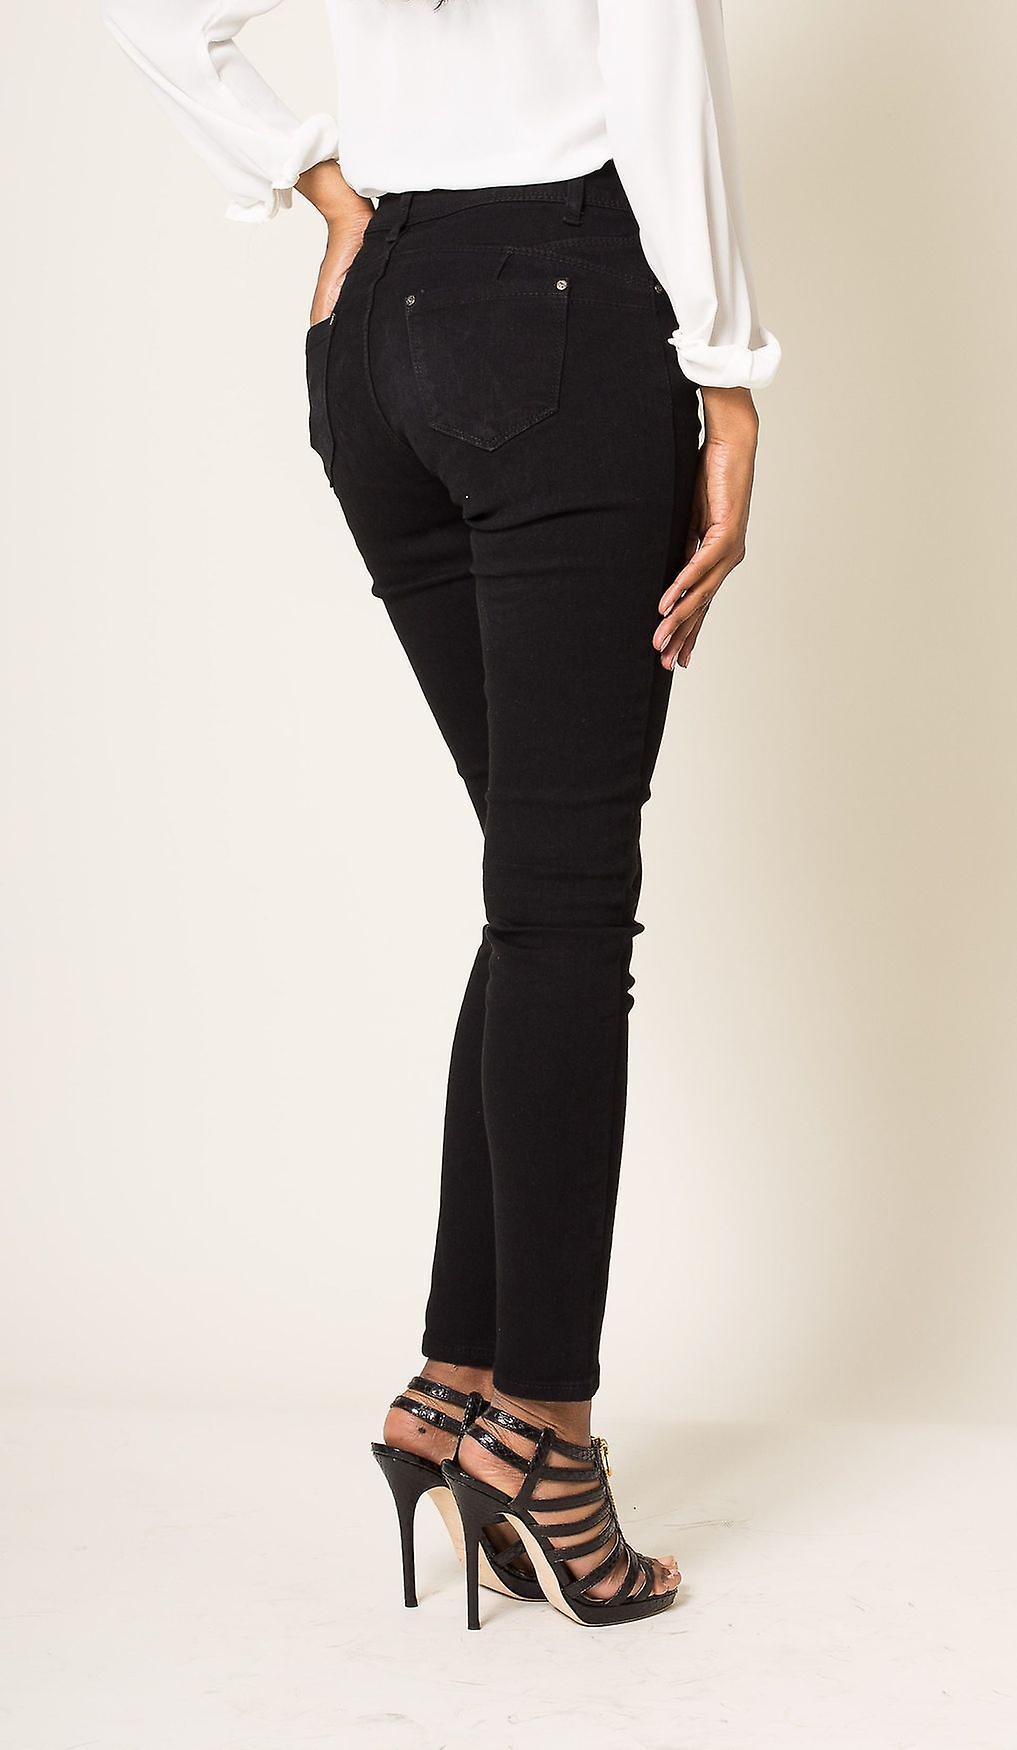 Womens Jeans Trousers Skinny Tube Slim Push Up Stretch Tube Treggings Jeggings